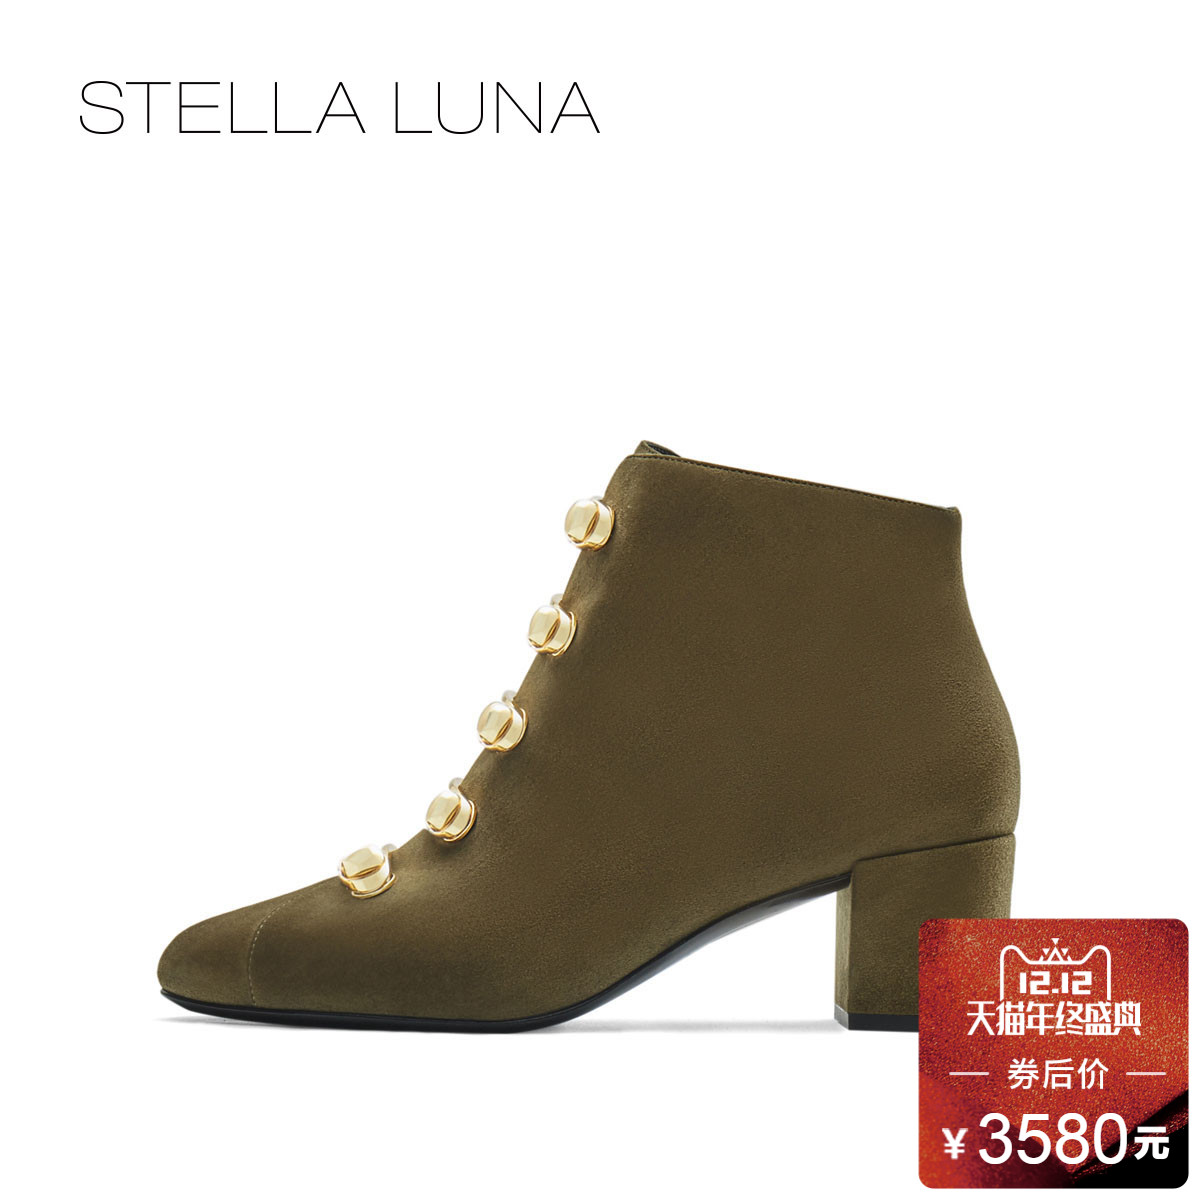 STELLA LUNA女靴2017冬季新款金属时尚搭扣短靴女粗跟SH320C22016